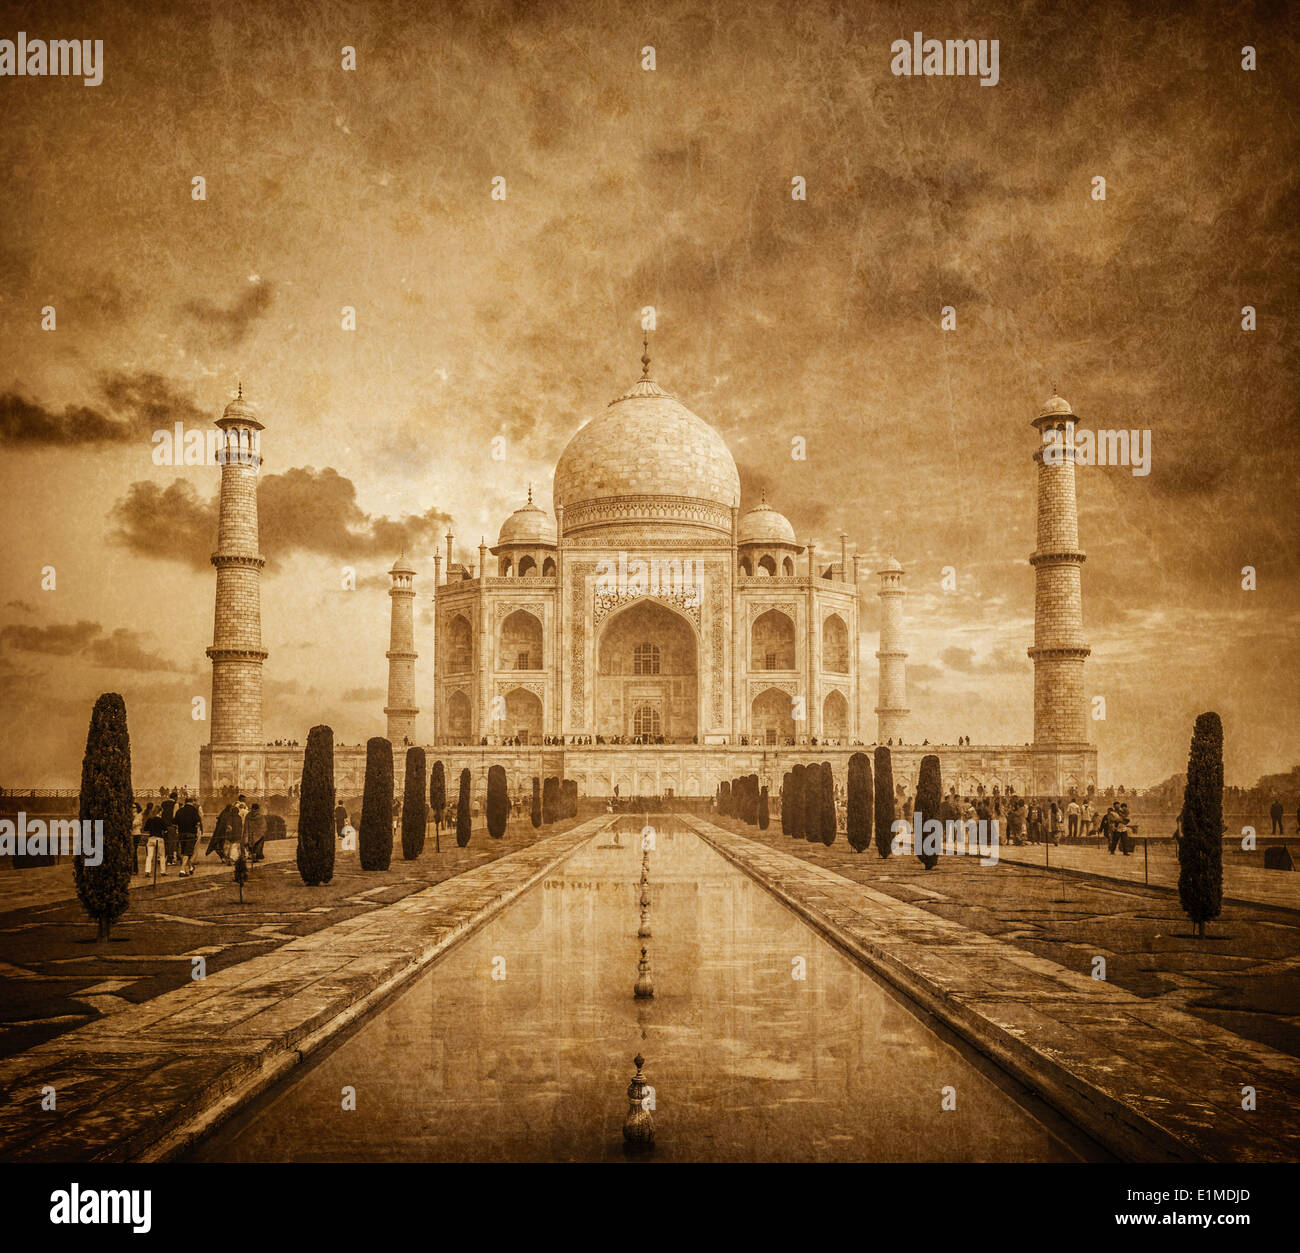 Taj Mahal immagine vintage. Simbolo indiano - India travel background. Agra, Uttar Pradesh, India Immagini Stock